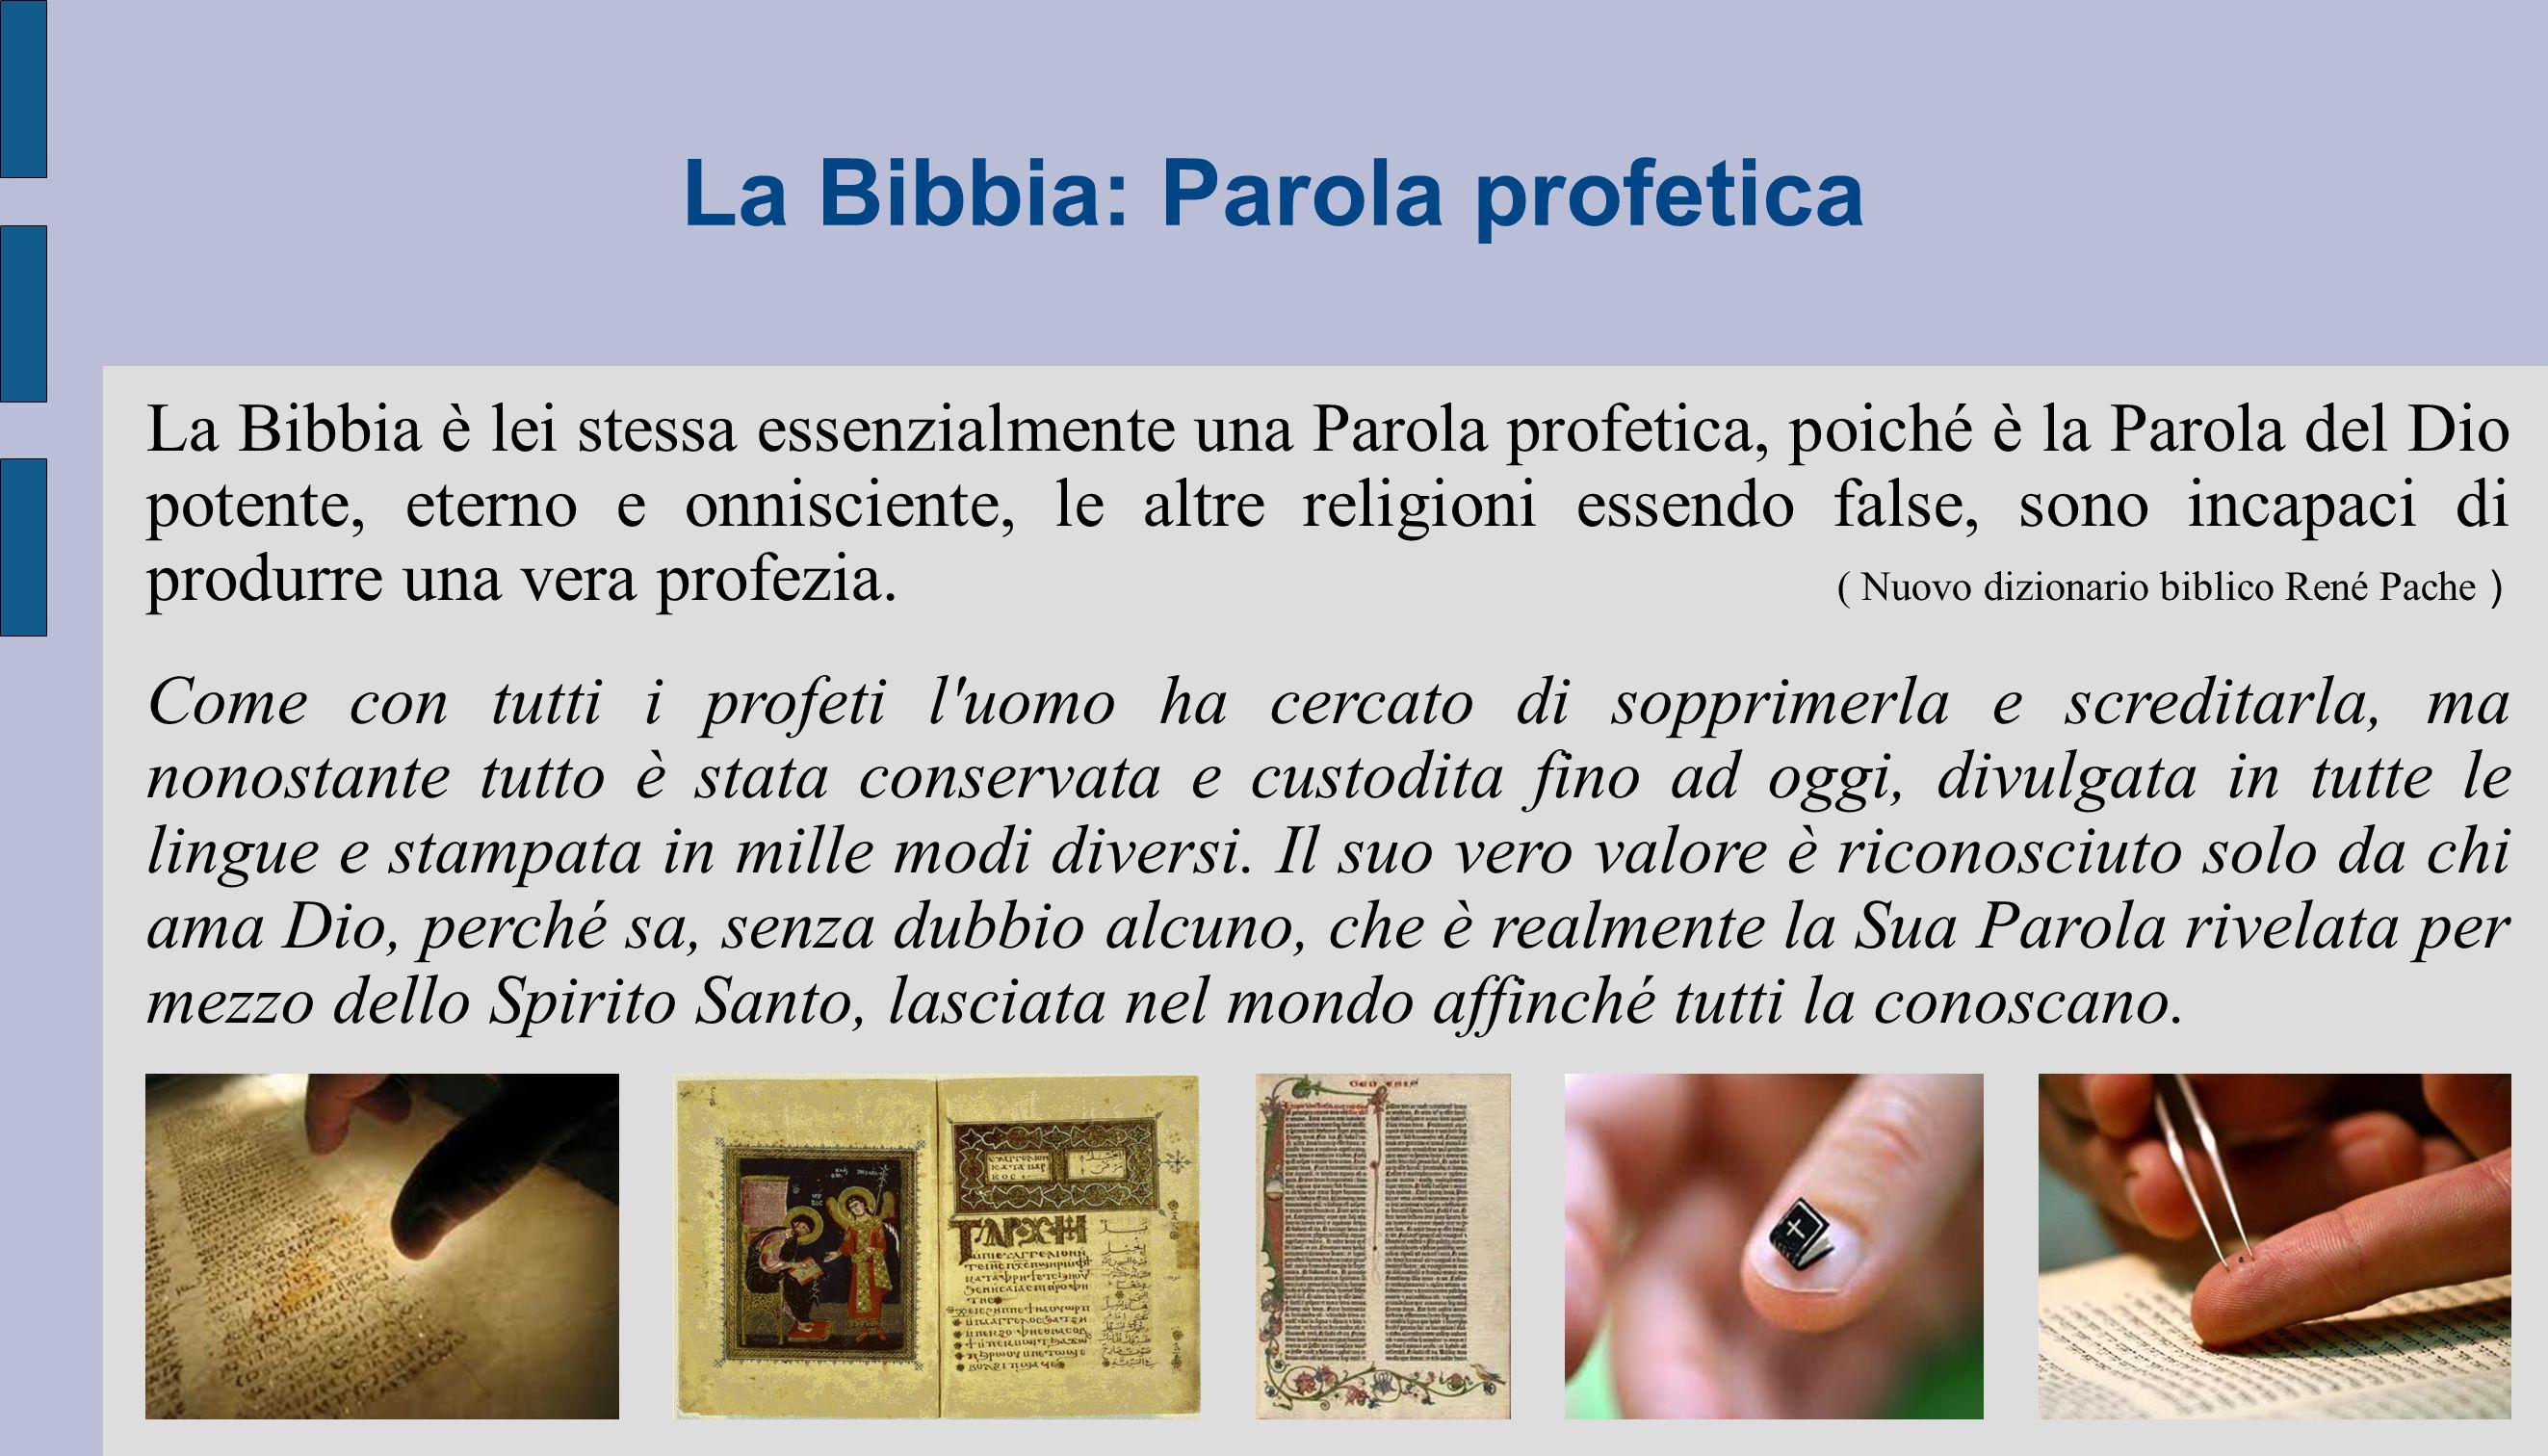 La Bibbia: Parola profetica